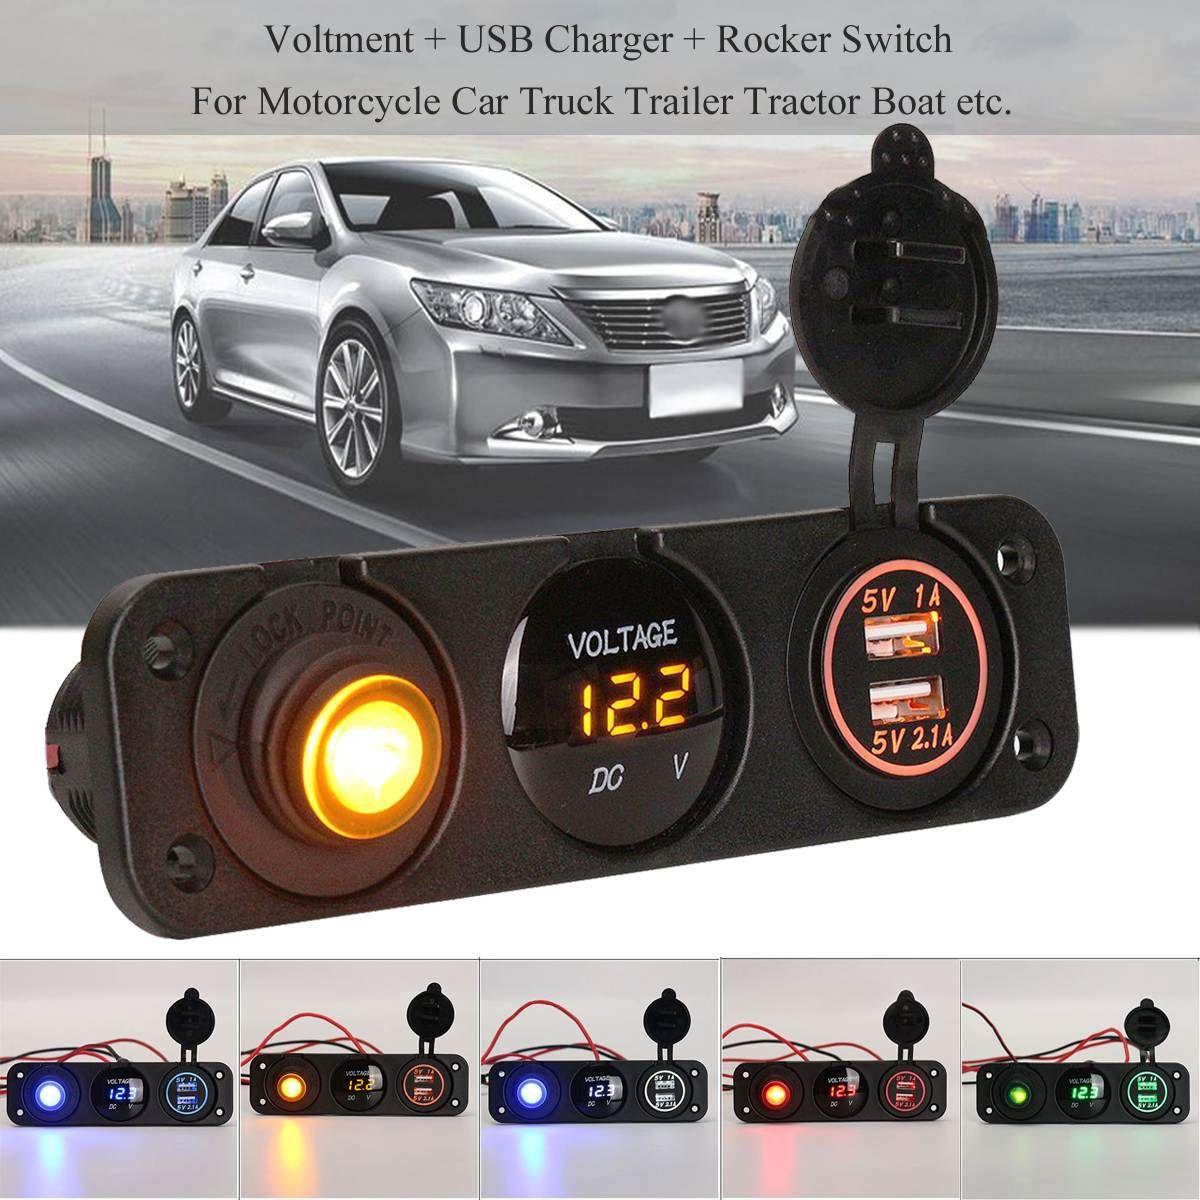 3 in 1 DC 12V 3.1A Universal Voltmeter Dual USB Car Charger Rocker Switch Cigarette lighter For Car Boat RV Truck